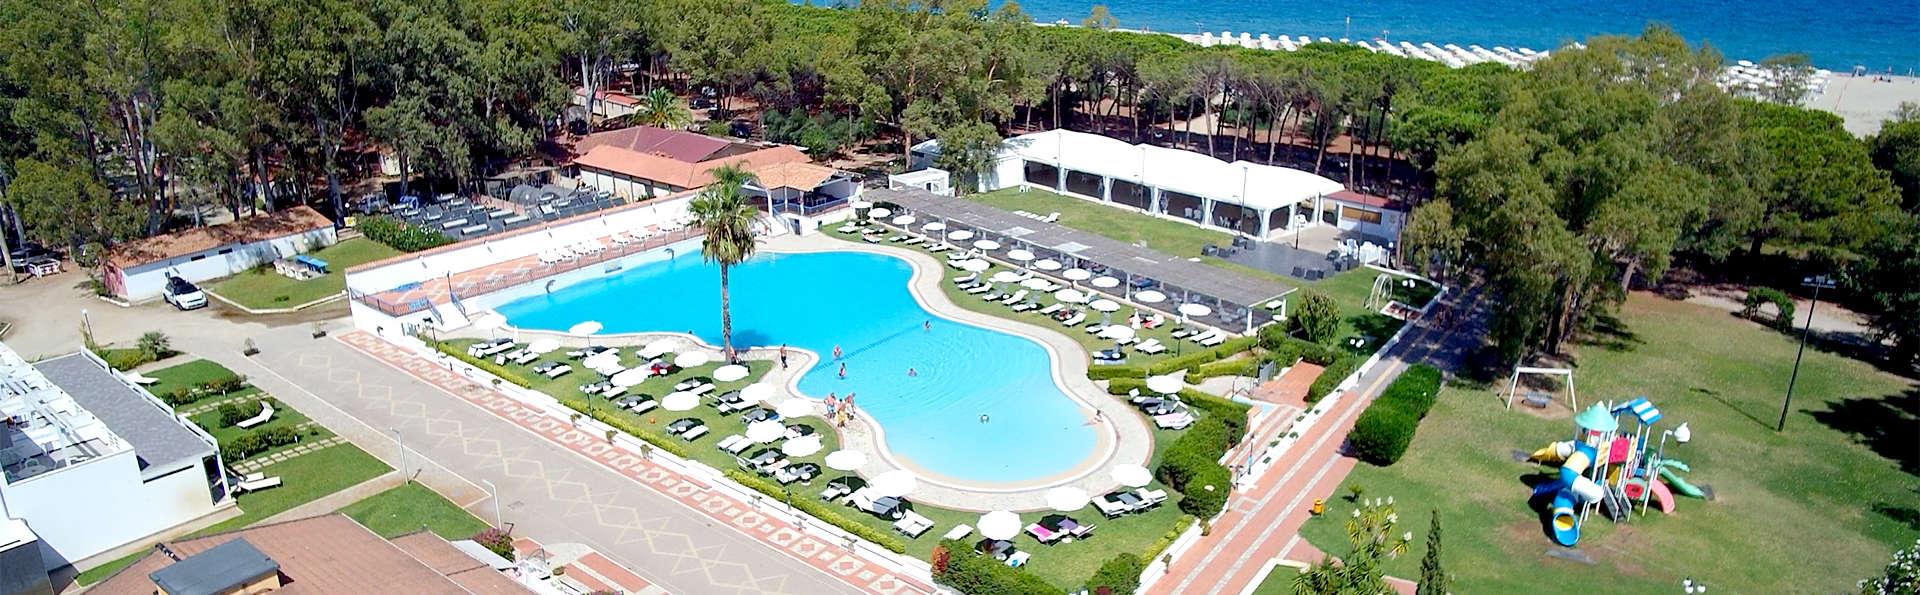 Salice Club Resort - Edit_View.jpg